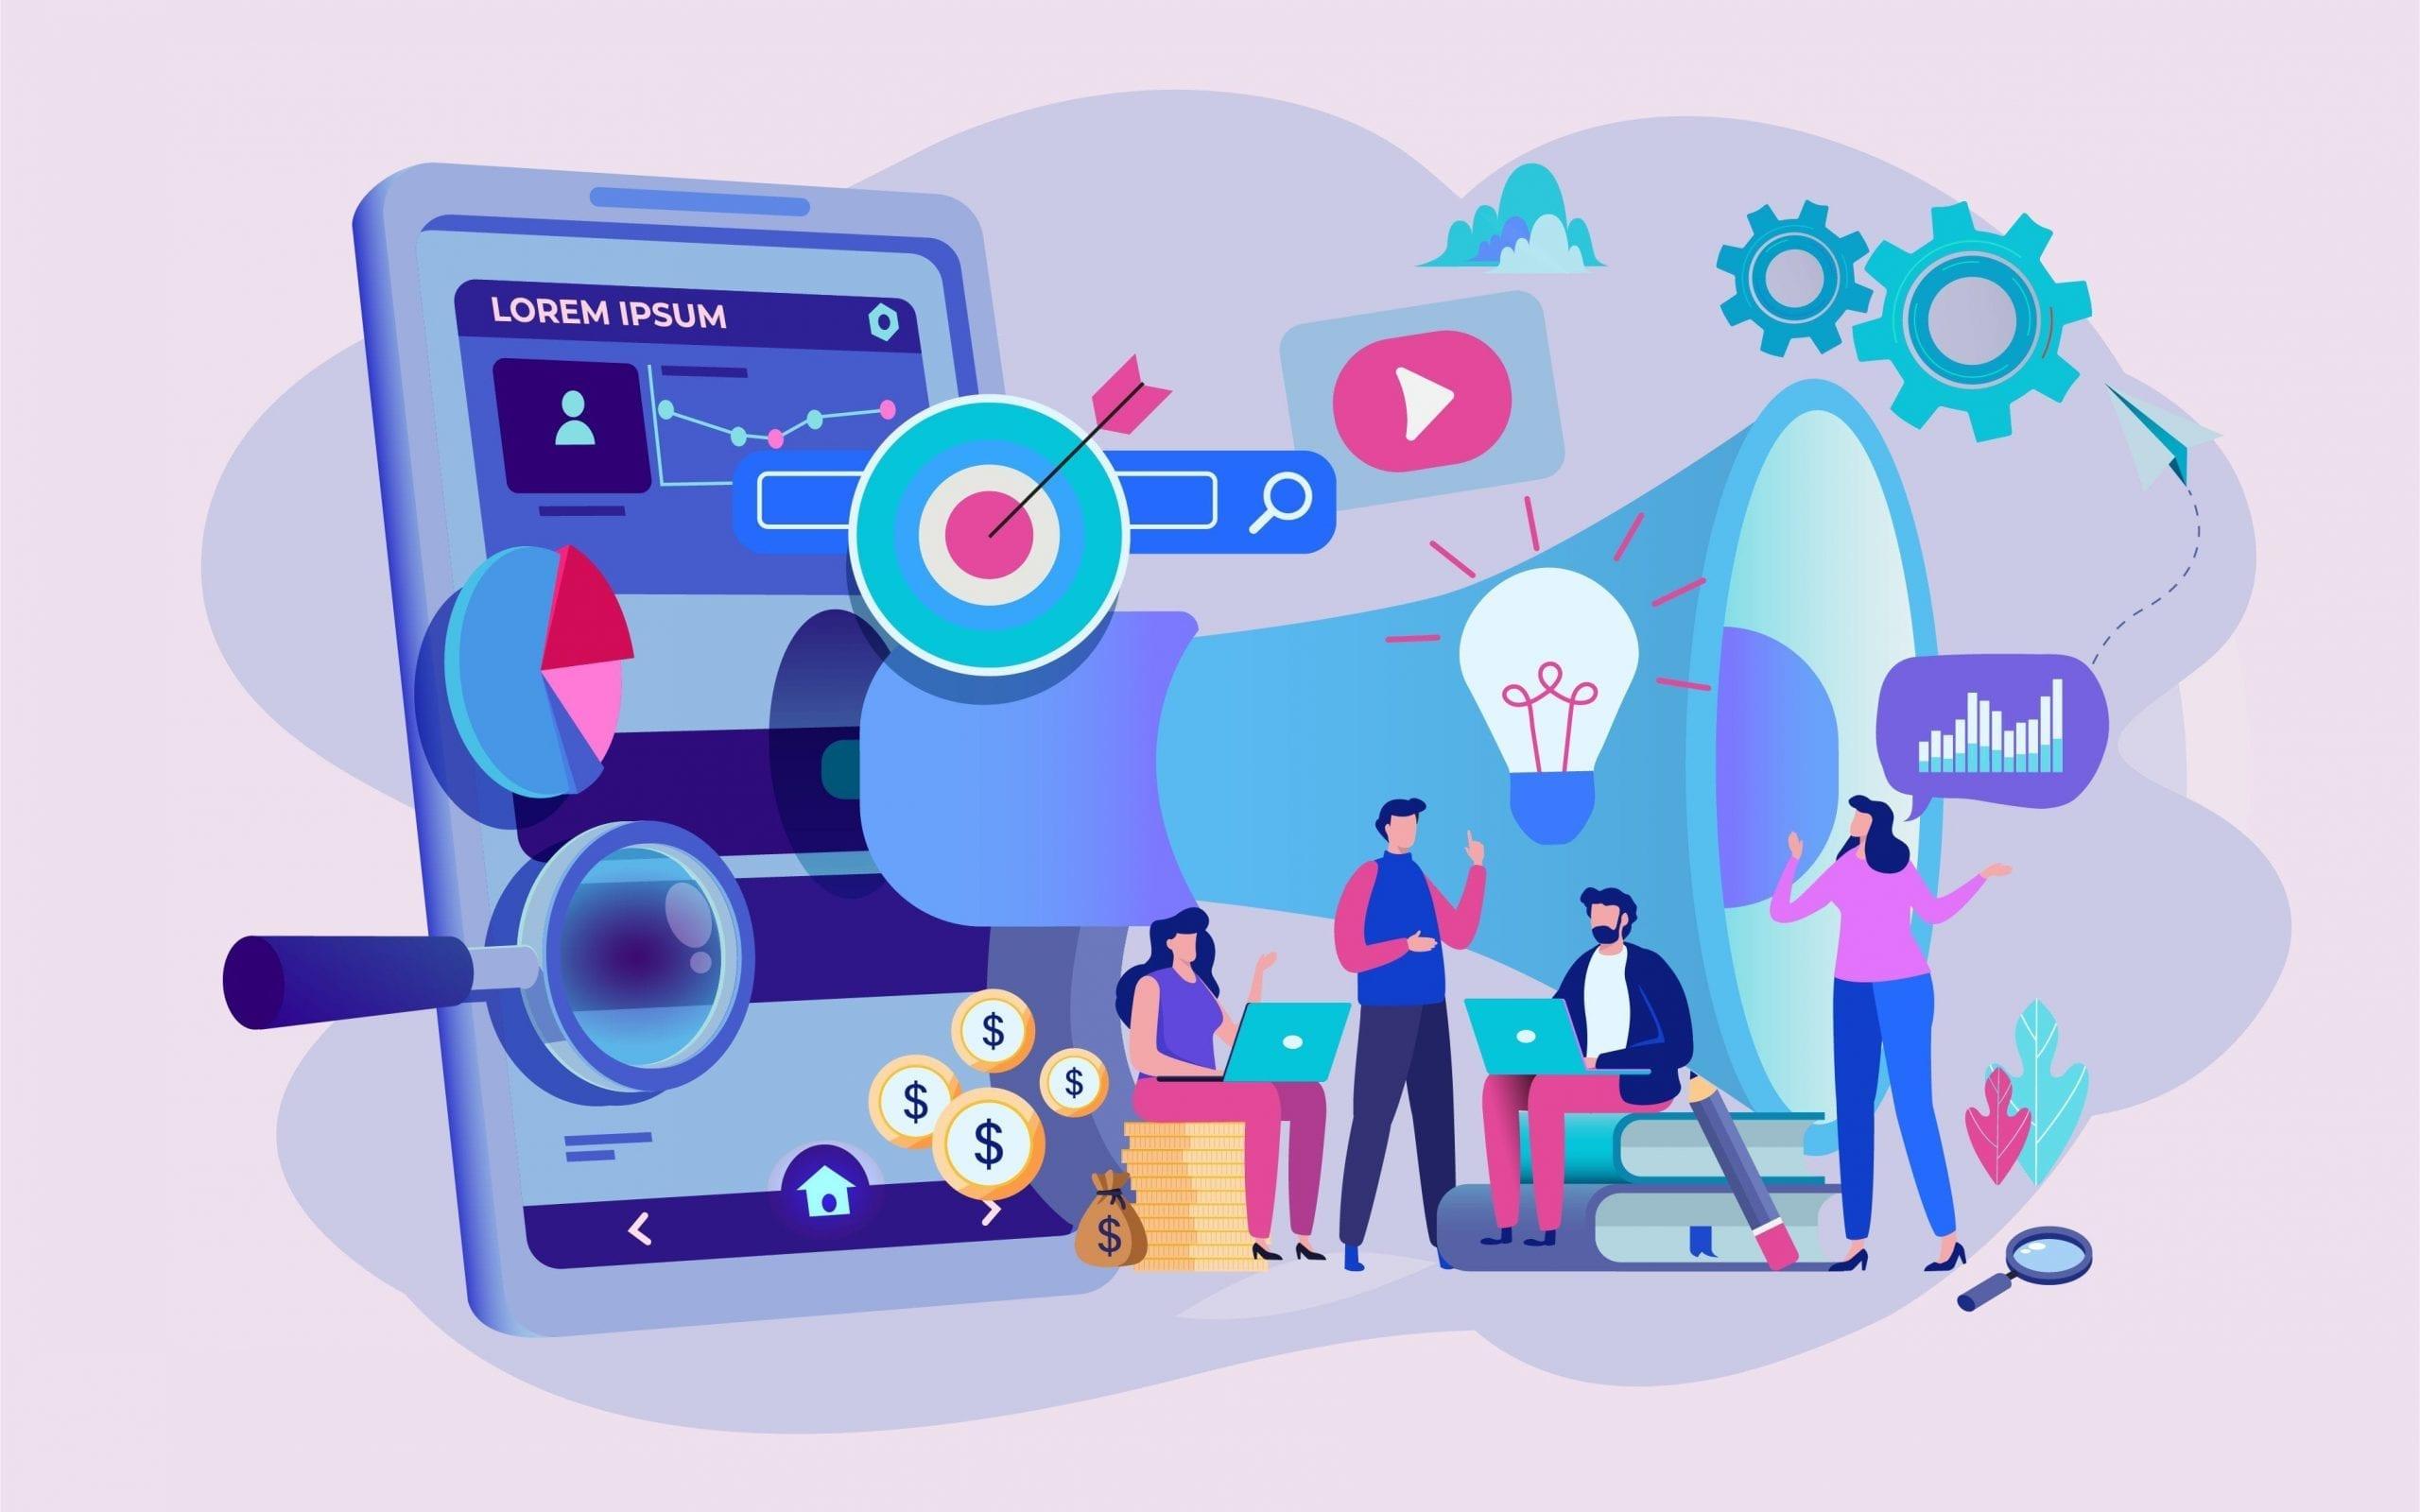 5 Ways to Level Up Your Digital Marketing